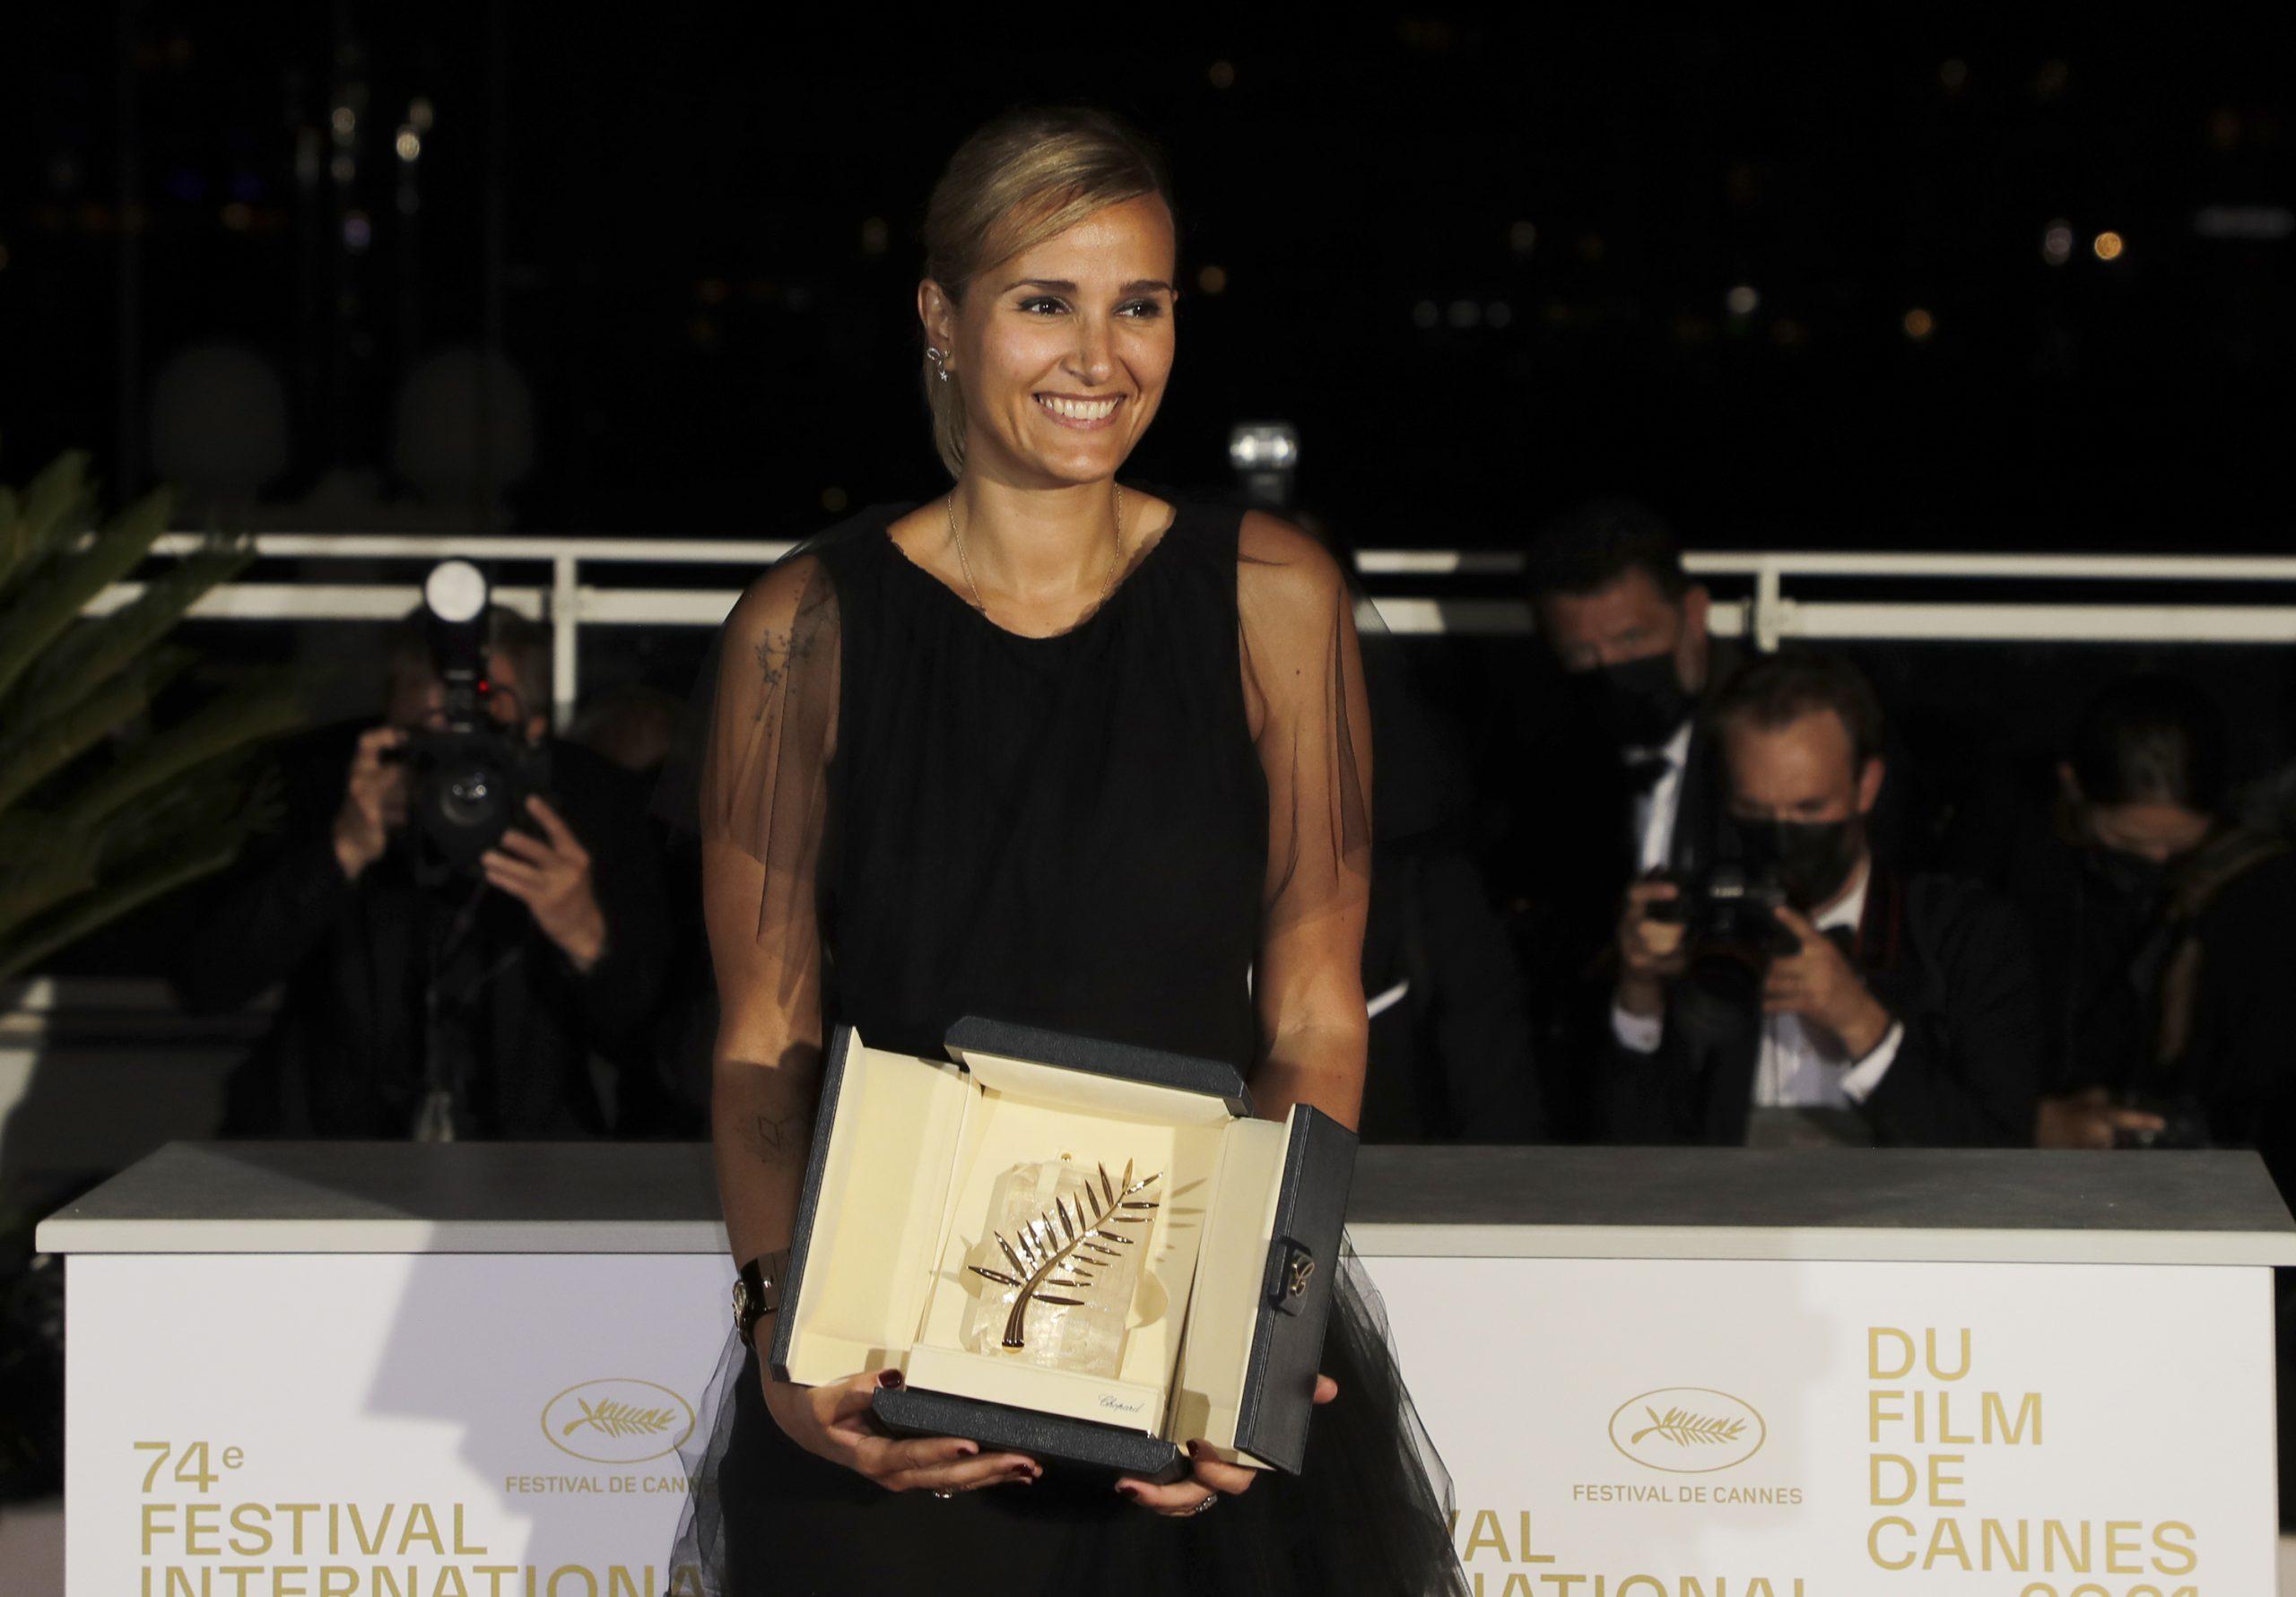 Cannes Film Festival: Winners Announced